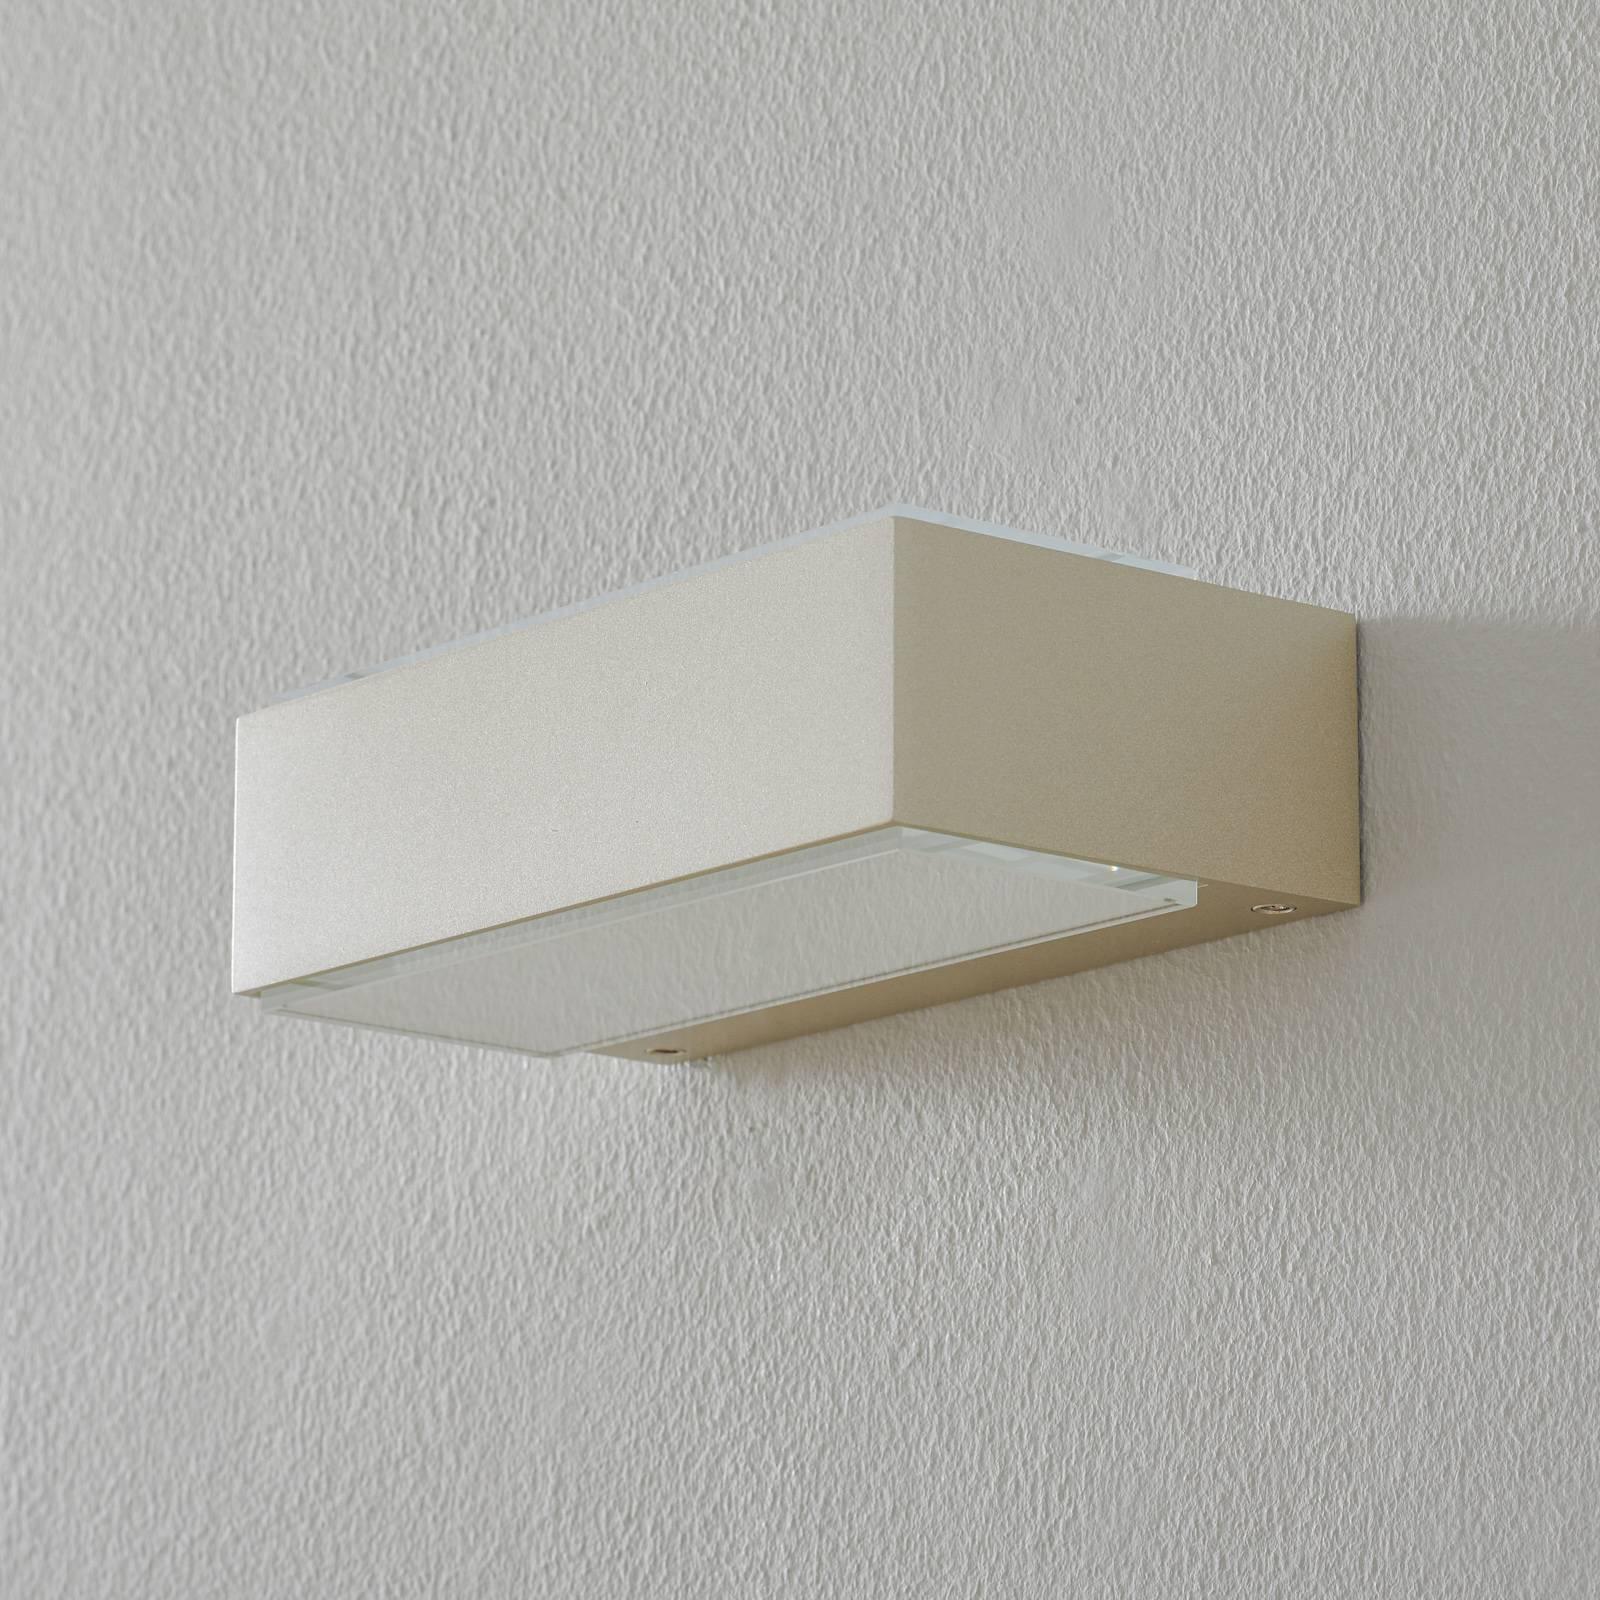 BEGA 12277 LED-seinävalaisin 3000K 20 cm palladium